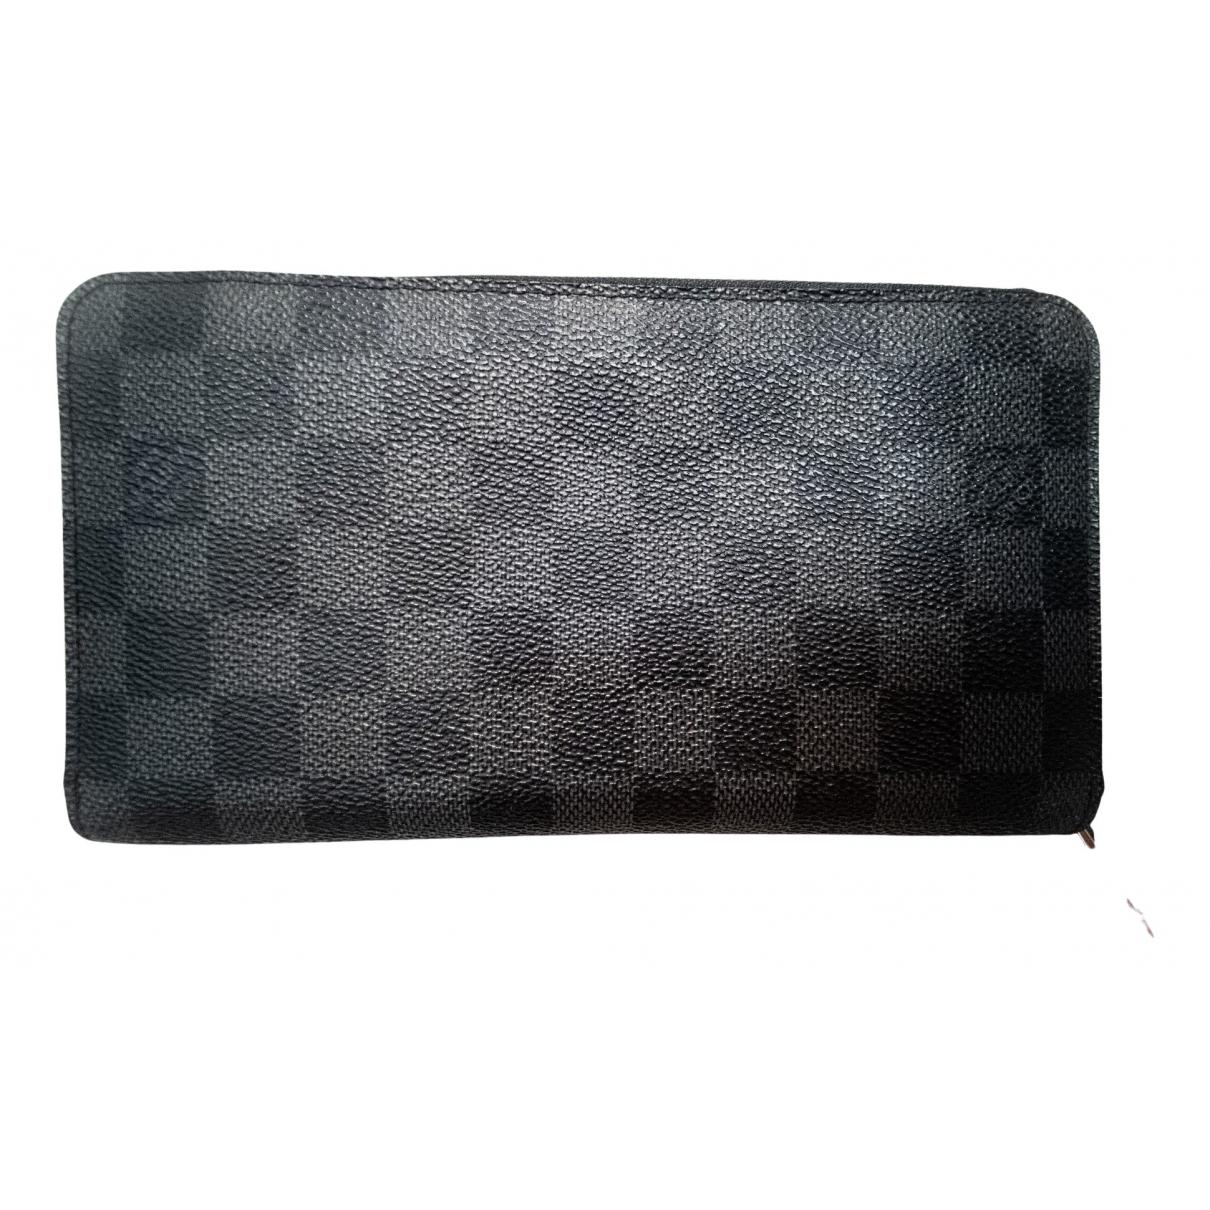 Louis Vuitton Zippy Anthracite Cloth wallet for Women \N